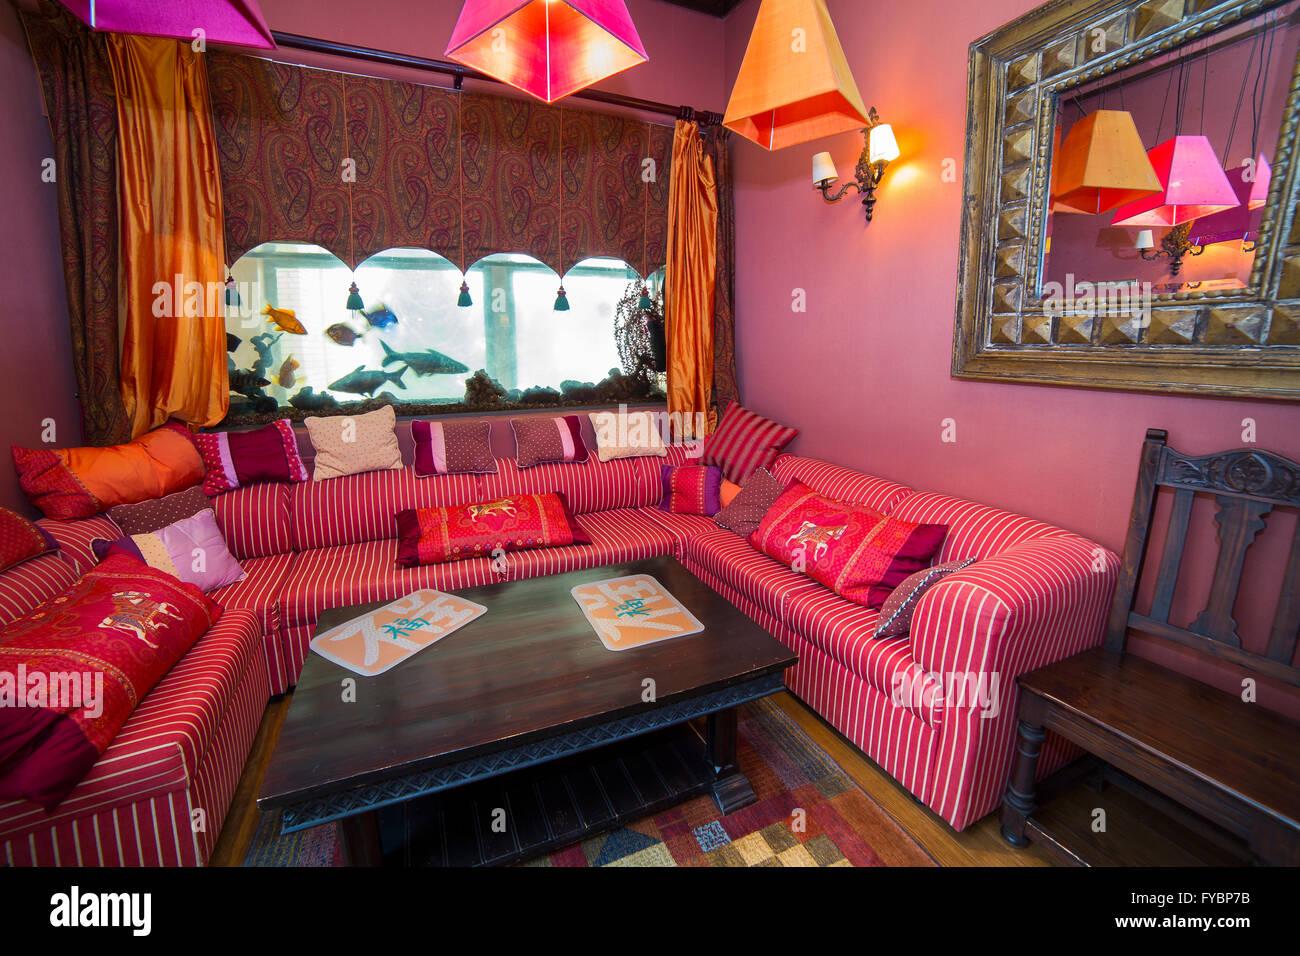 Restaurant In Oriental Design With Sofa Stock Photo Alamy